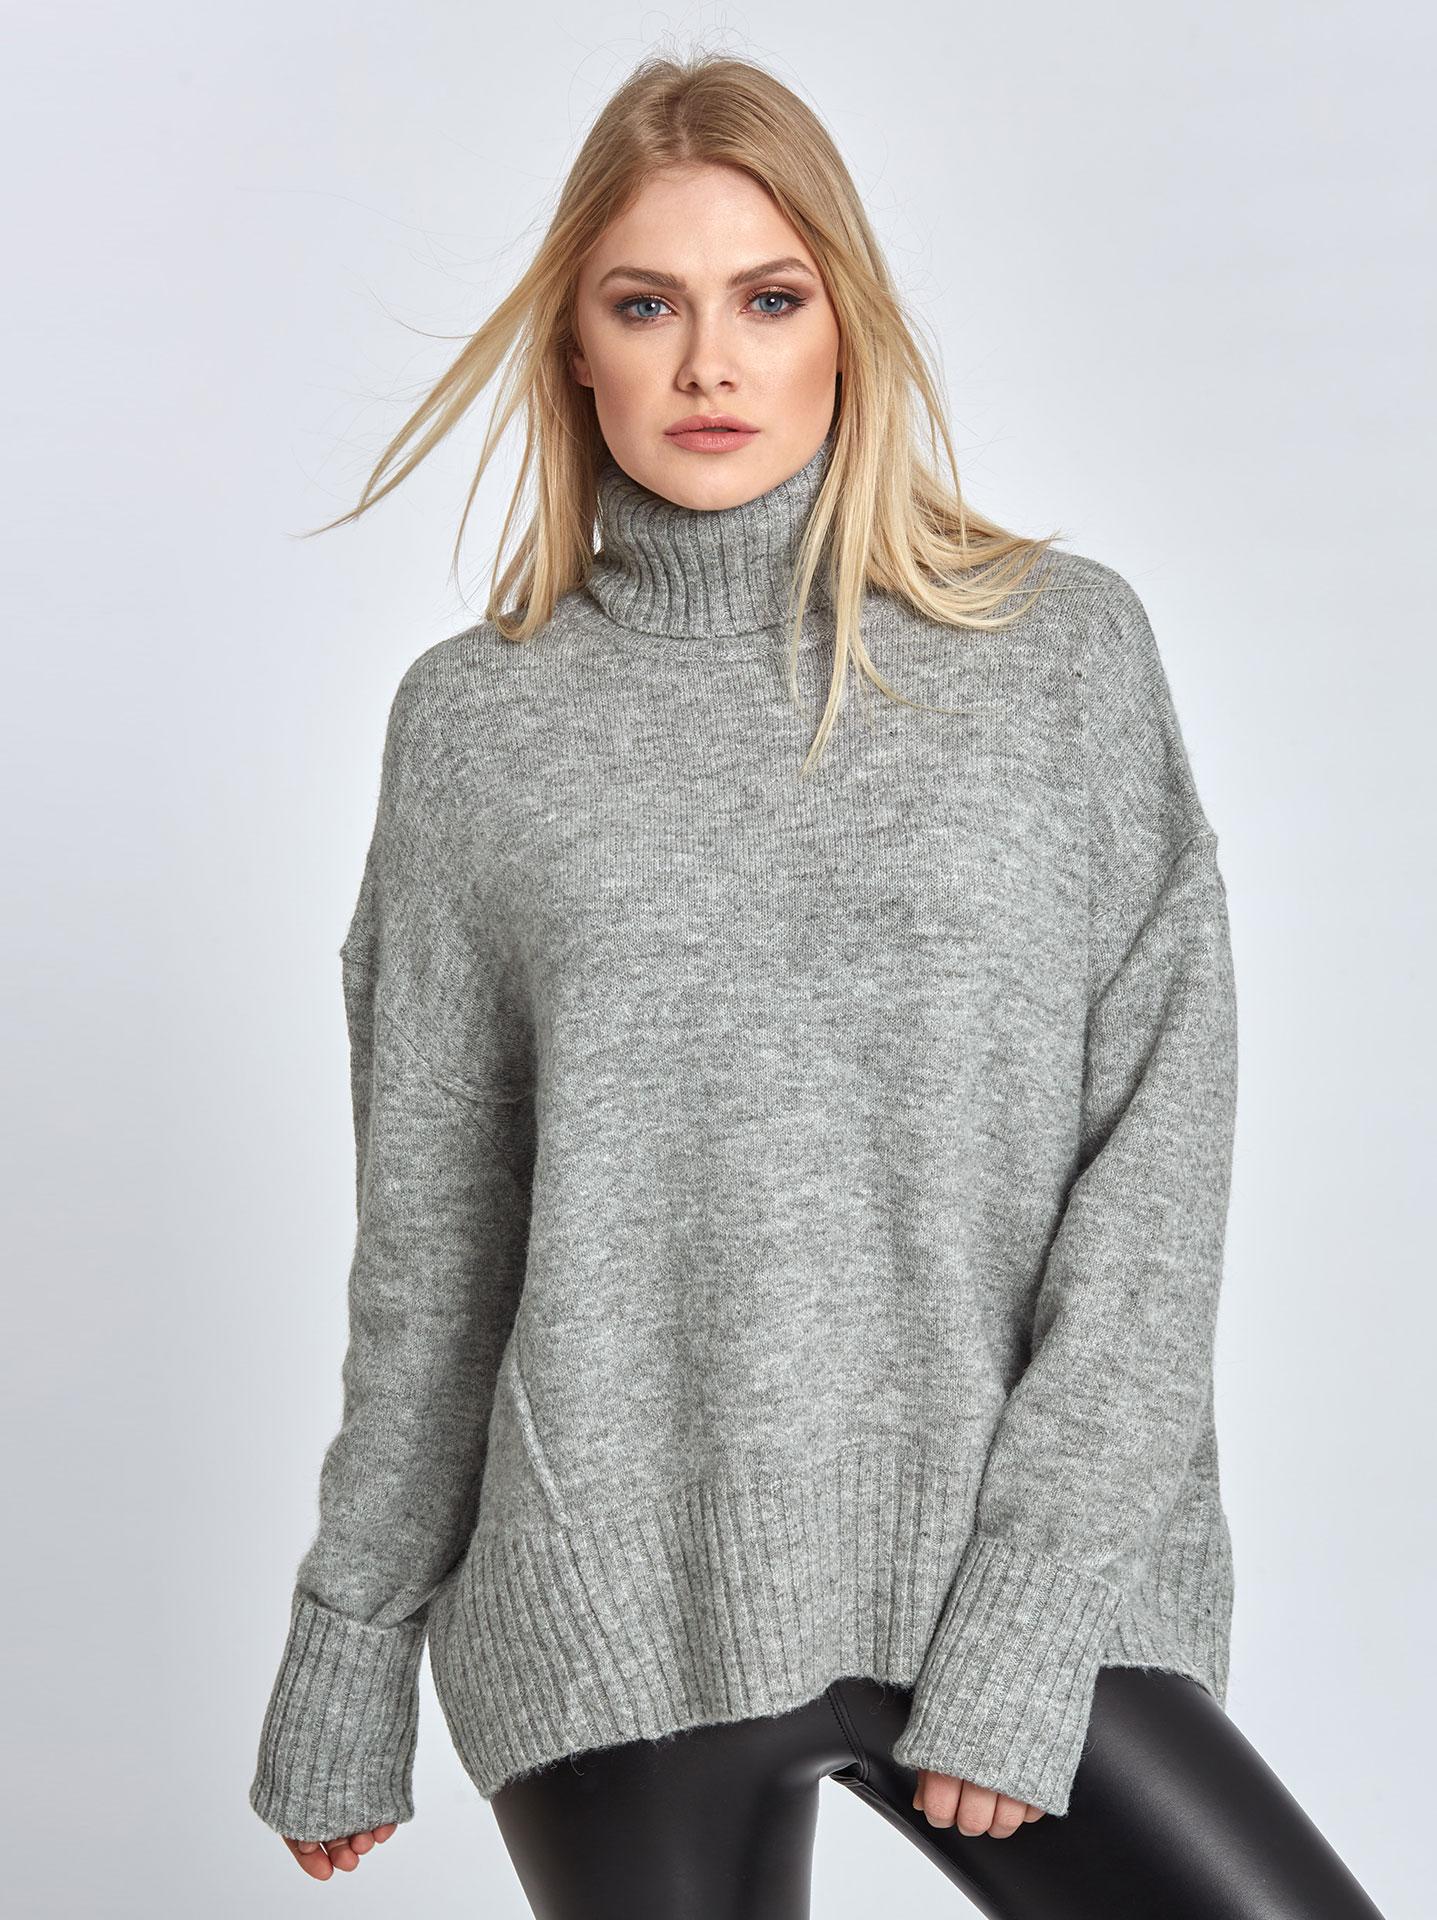 5baaa9627d9b Ζιβάγκο πλεκτό πουλόβερ σε γκρι